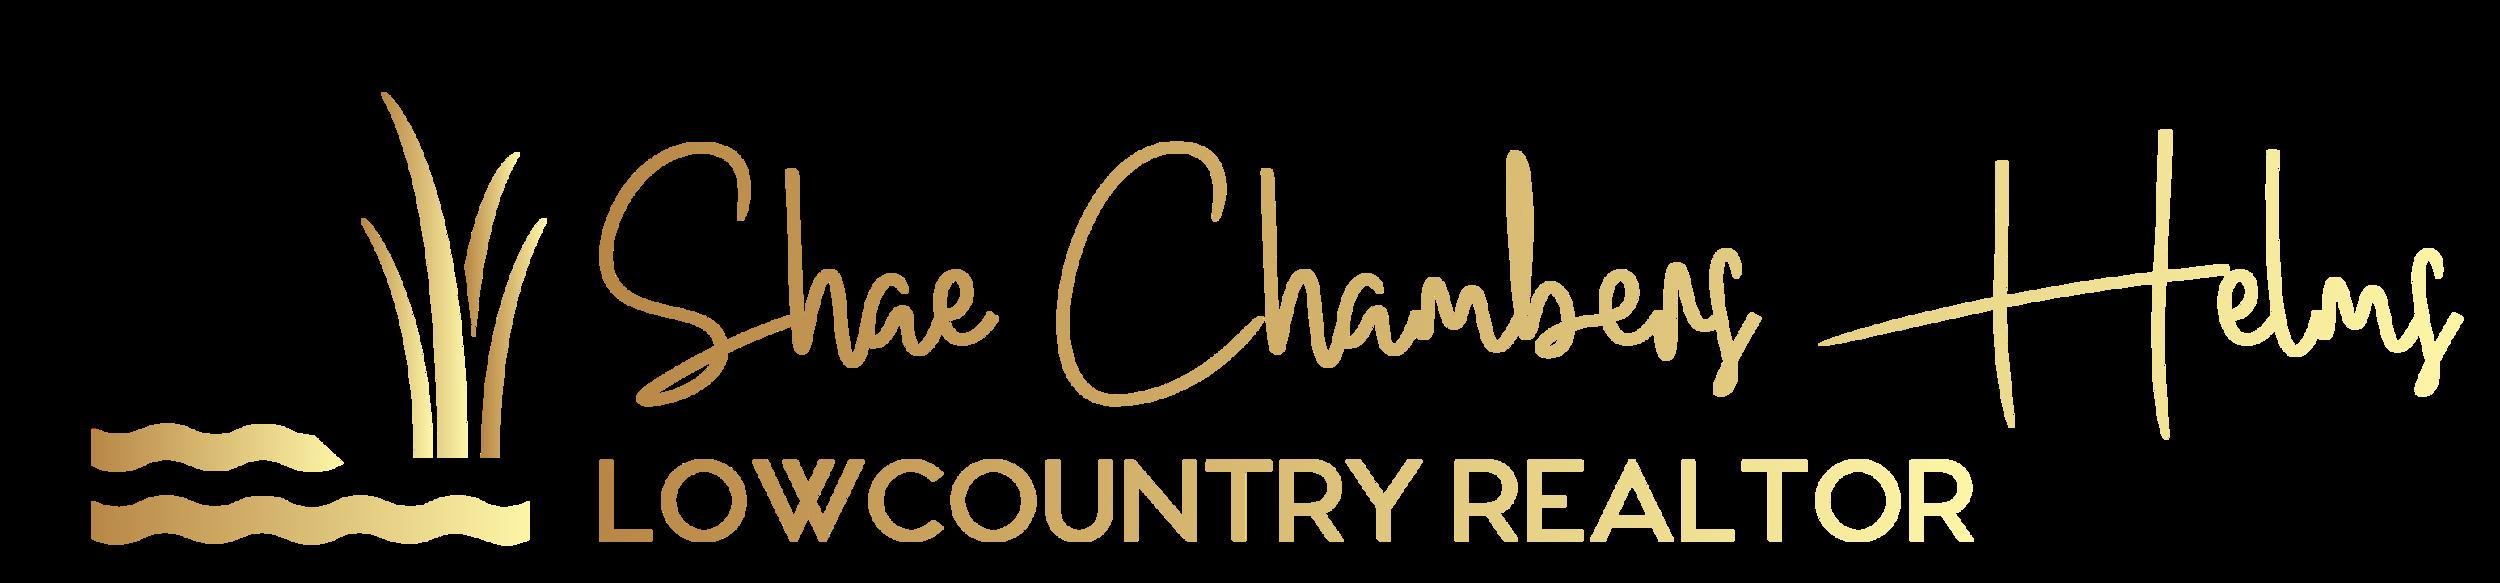 Shad-Chambers-Logo